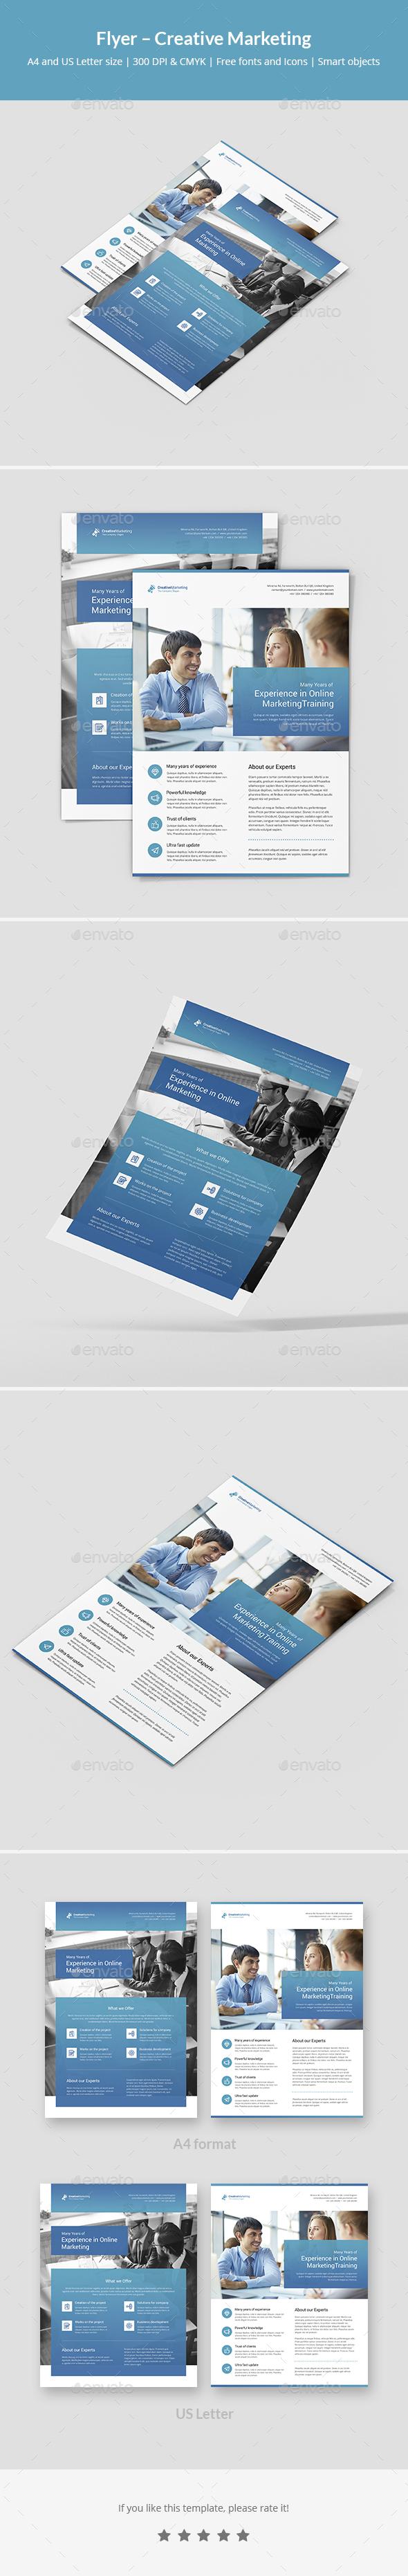 Flyer – Creative Marketing - Corporate Flyers